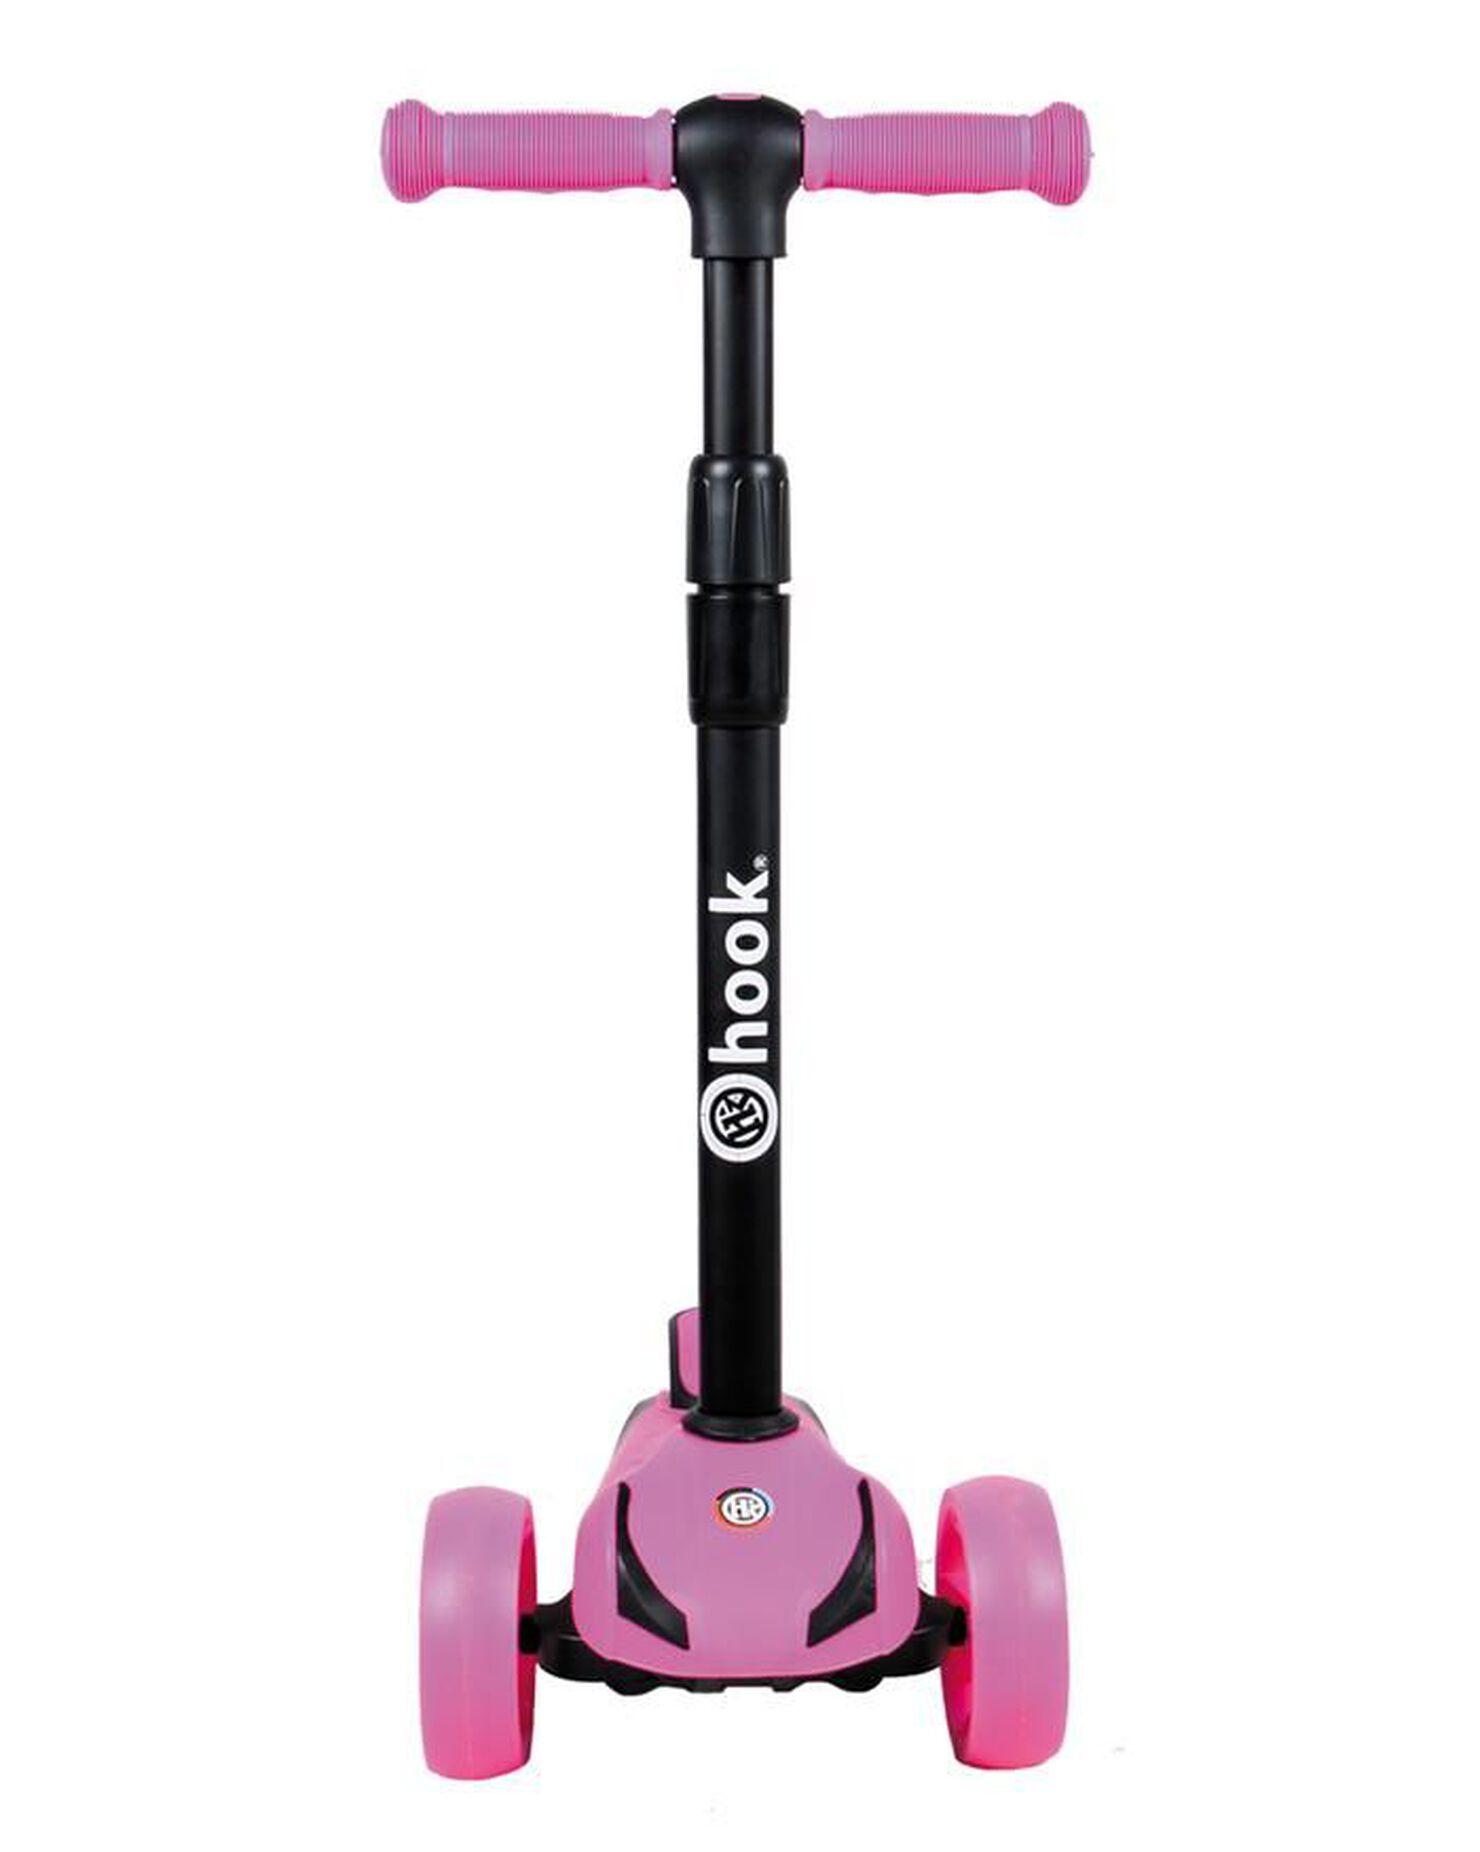 Maxi Scooter Color Rosado Hook